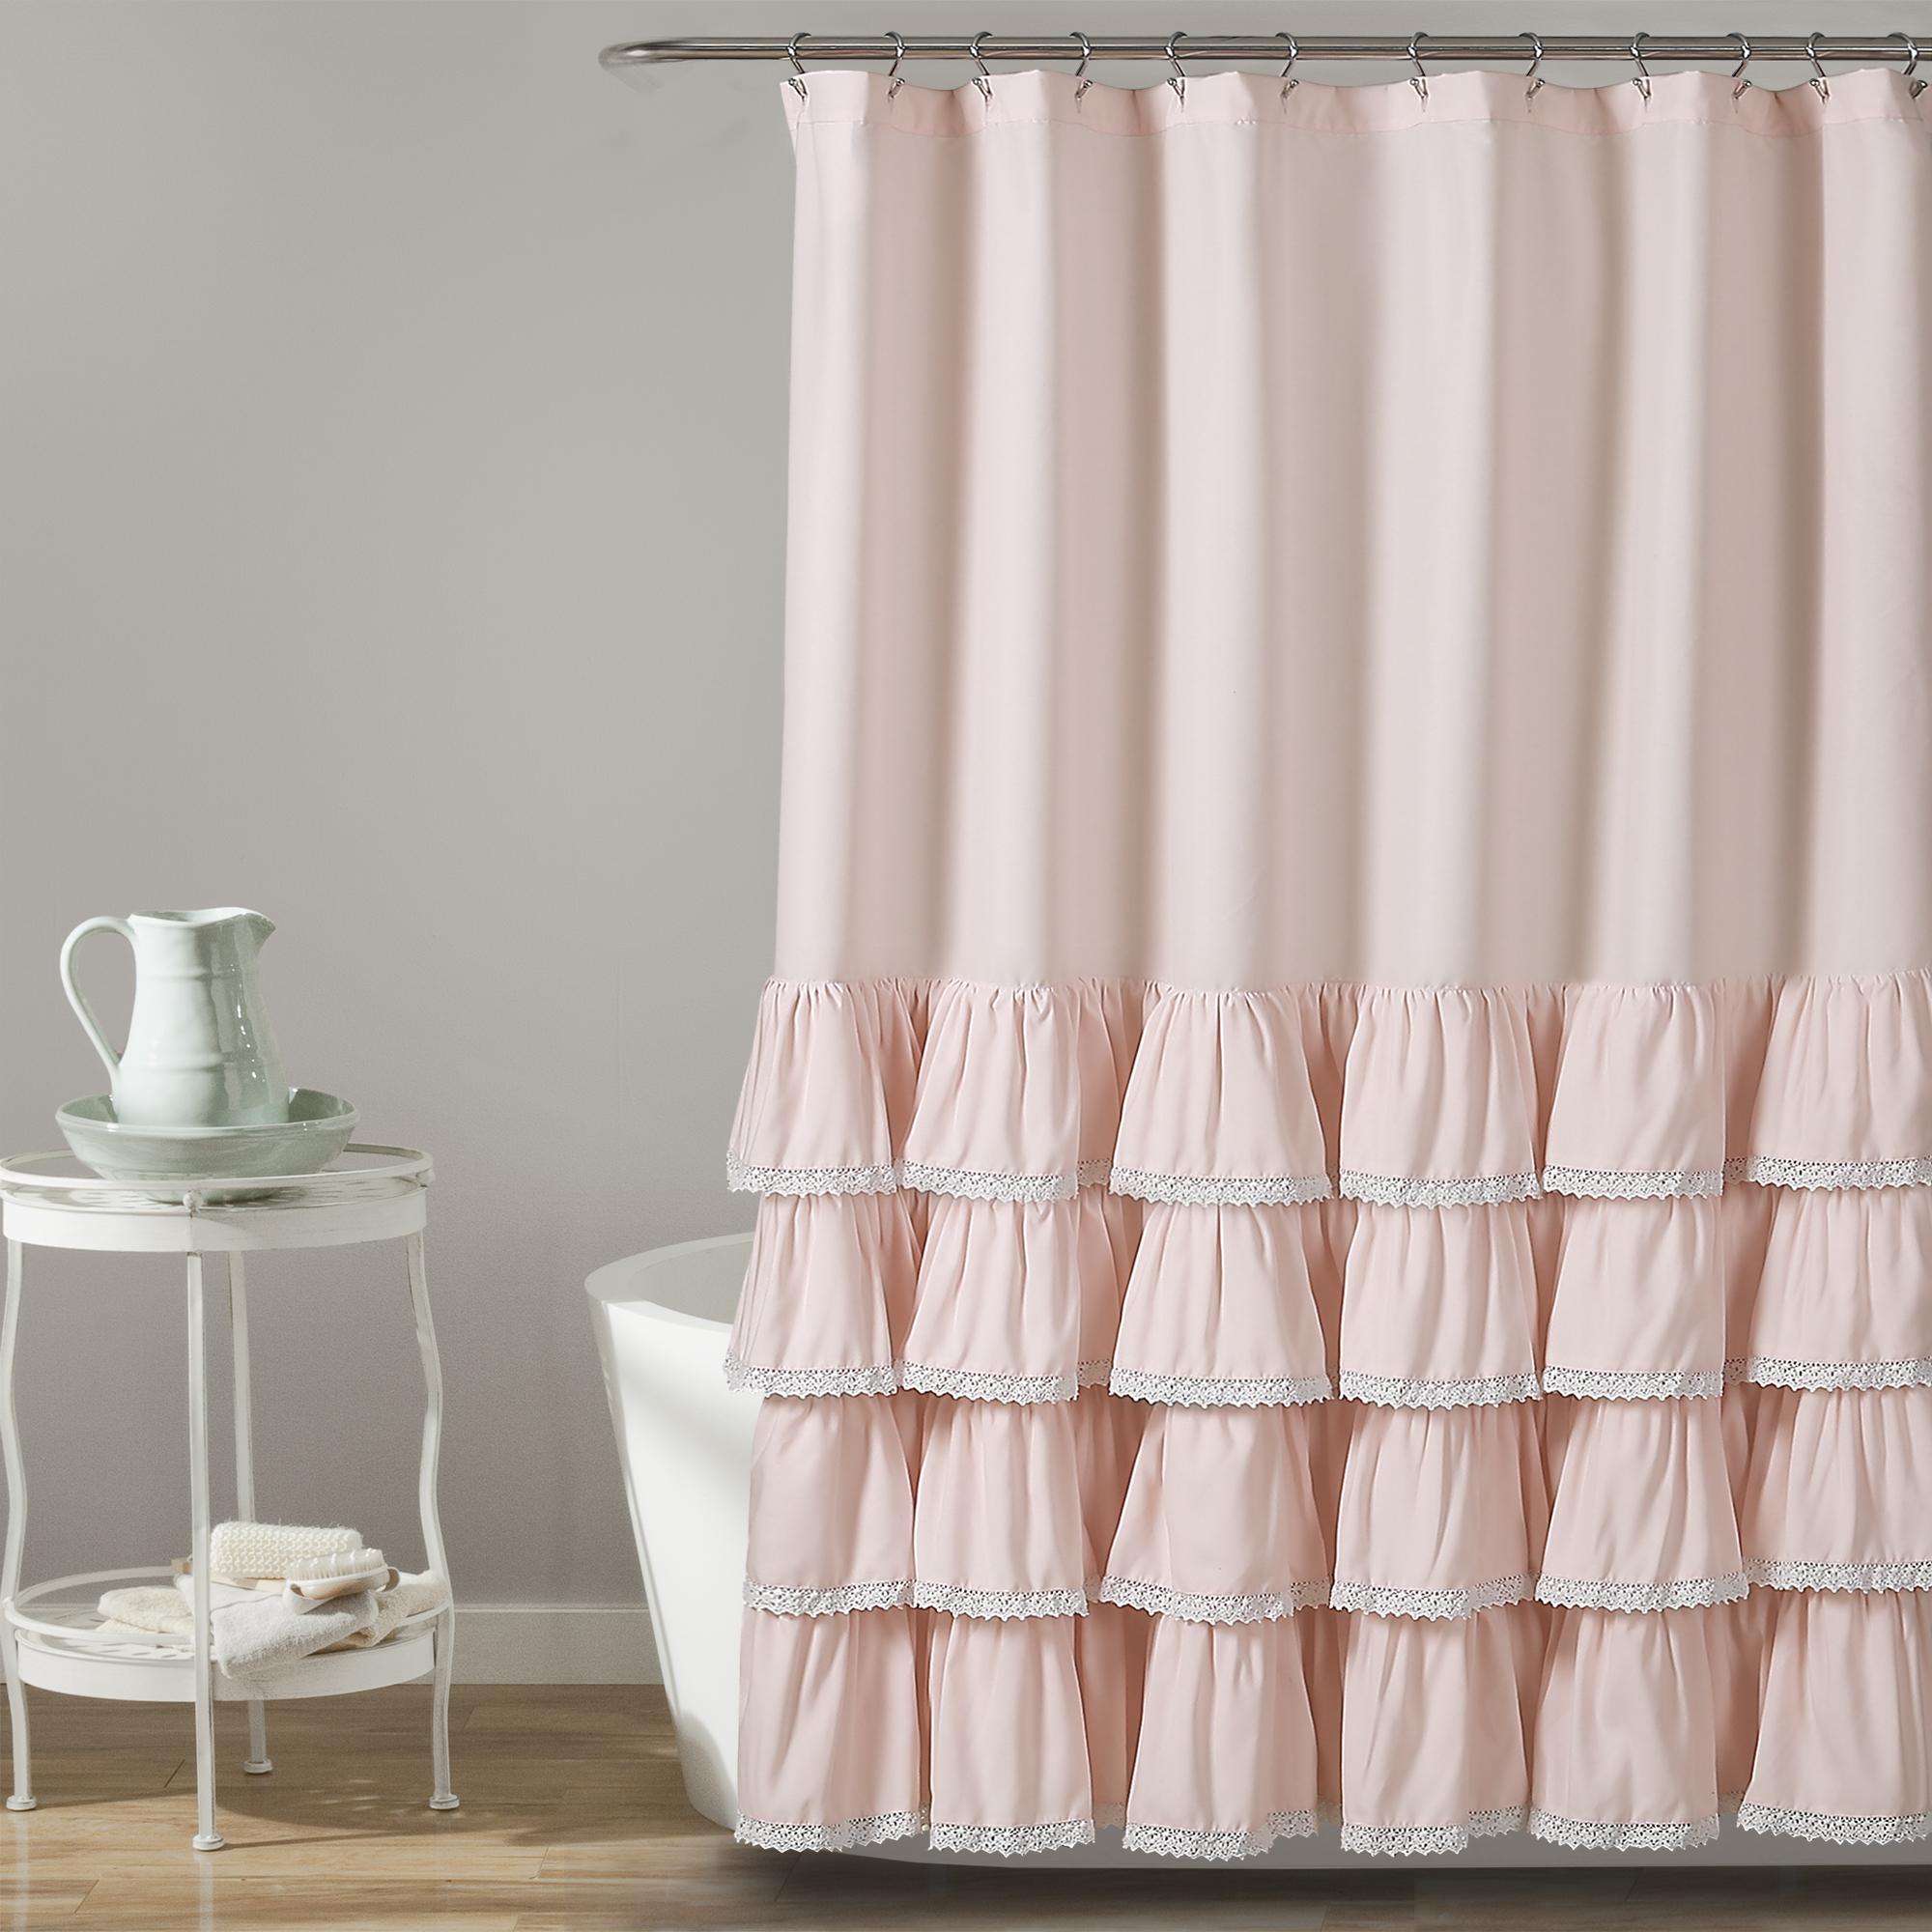 Ella Lace Ruffle Shower Curtain White 72X72 | eBay